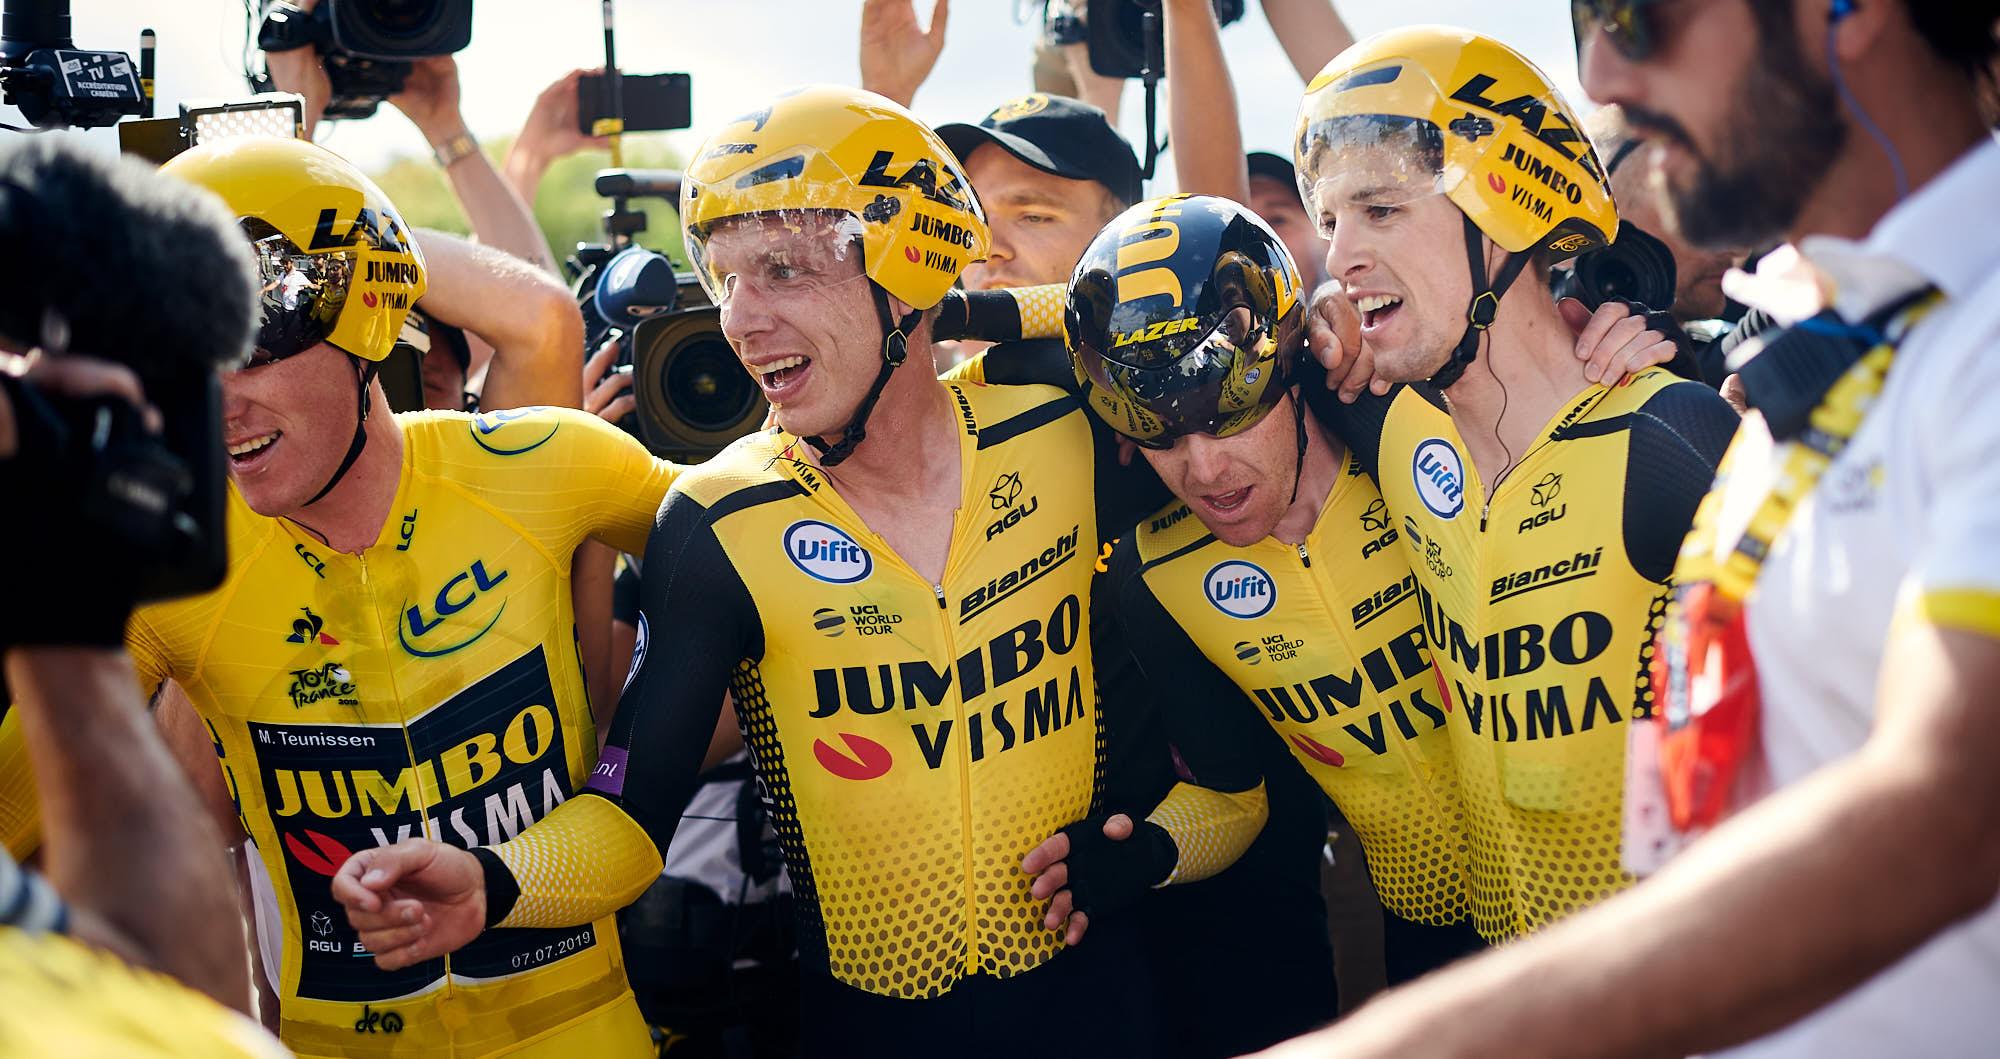 Team Jumbo-Visma riders embrace after winning the 2019 Tour de France team time trial